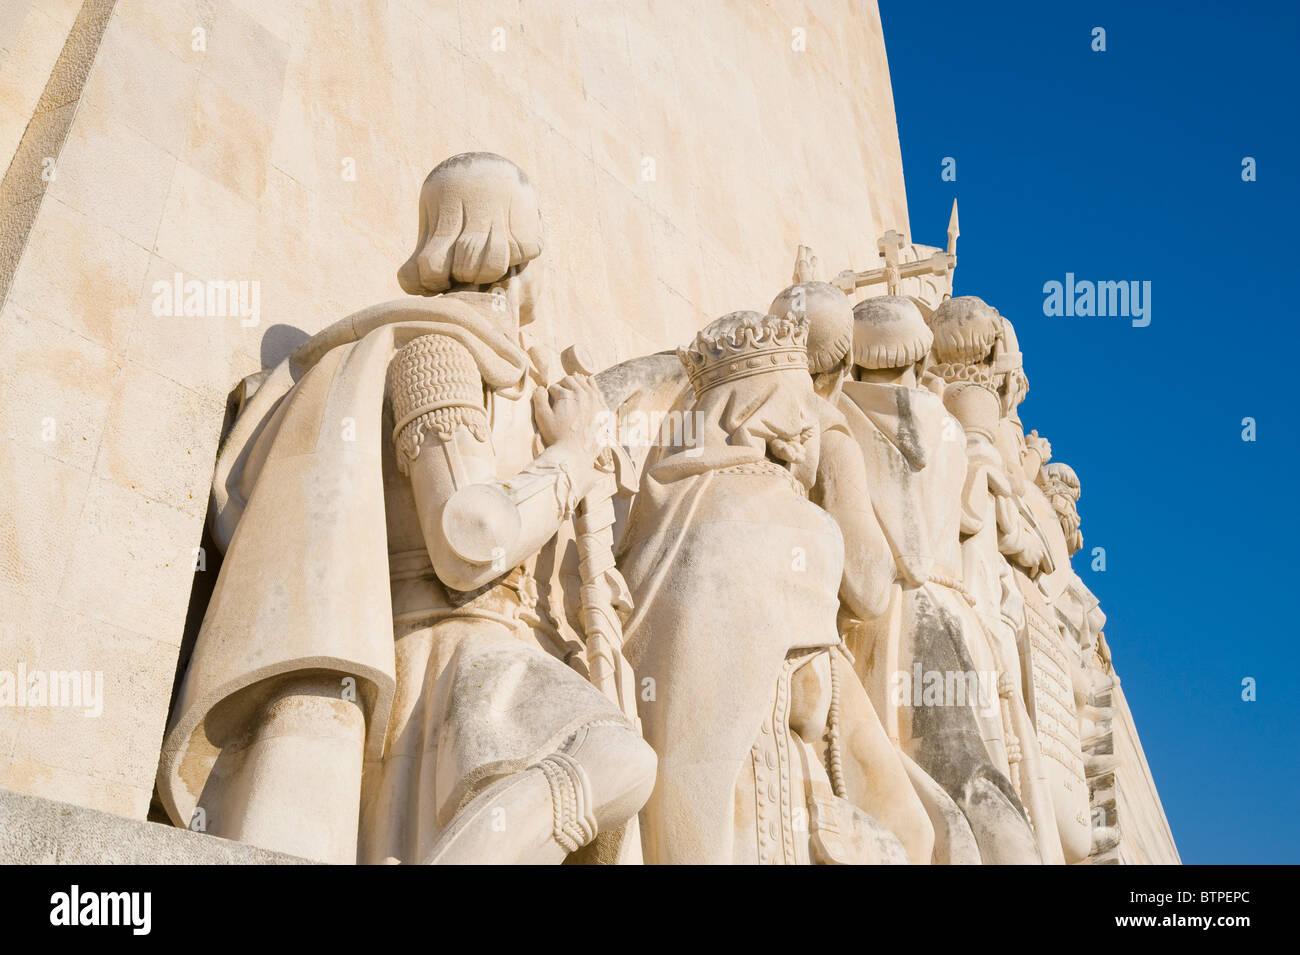 Denkmal der Entdeckungen, Lissabon, Portugal Stockbild